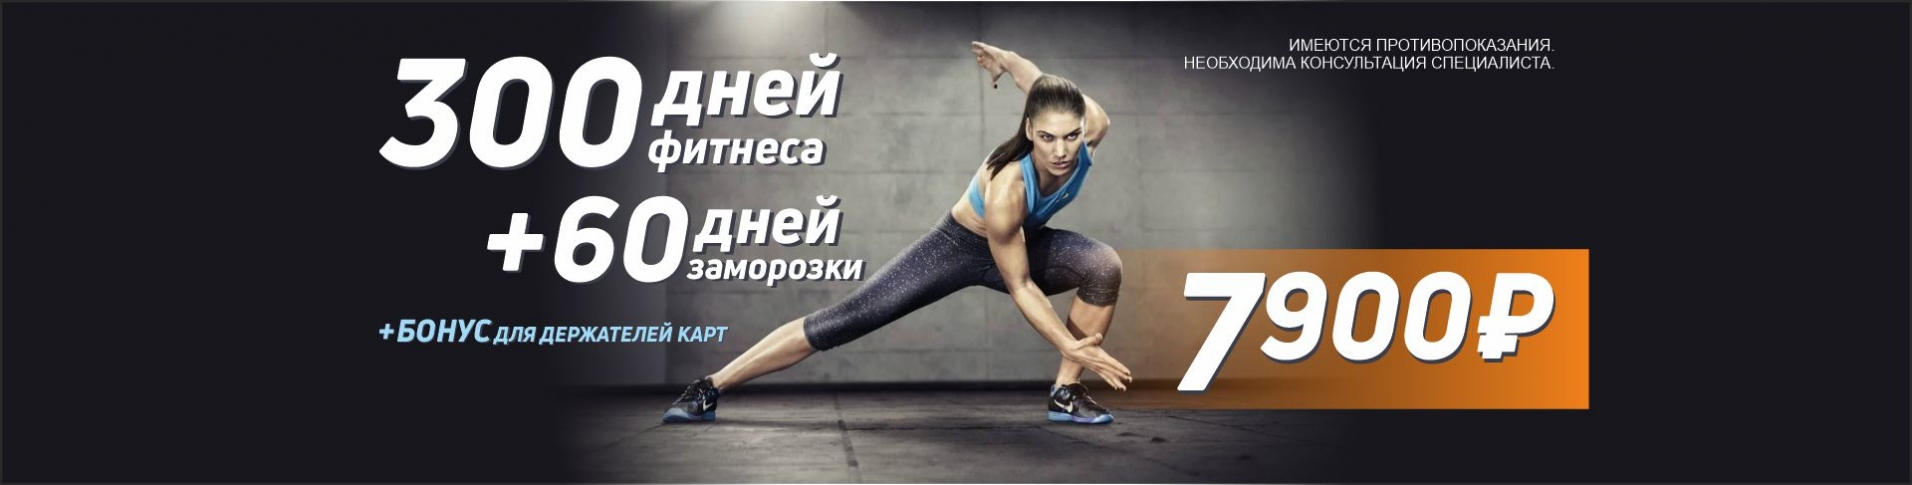 /events/300-dney-fitnesa-za-7900